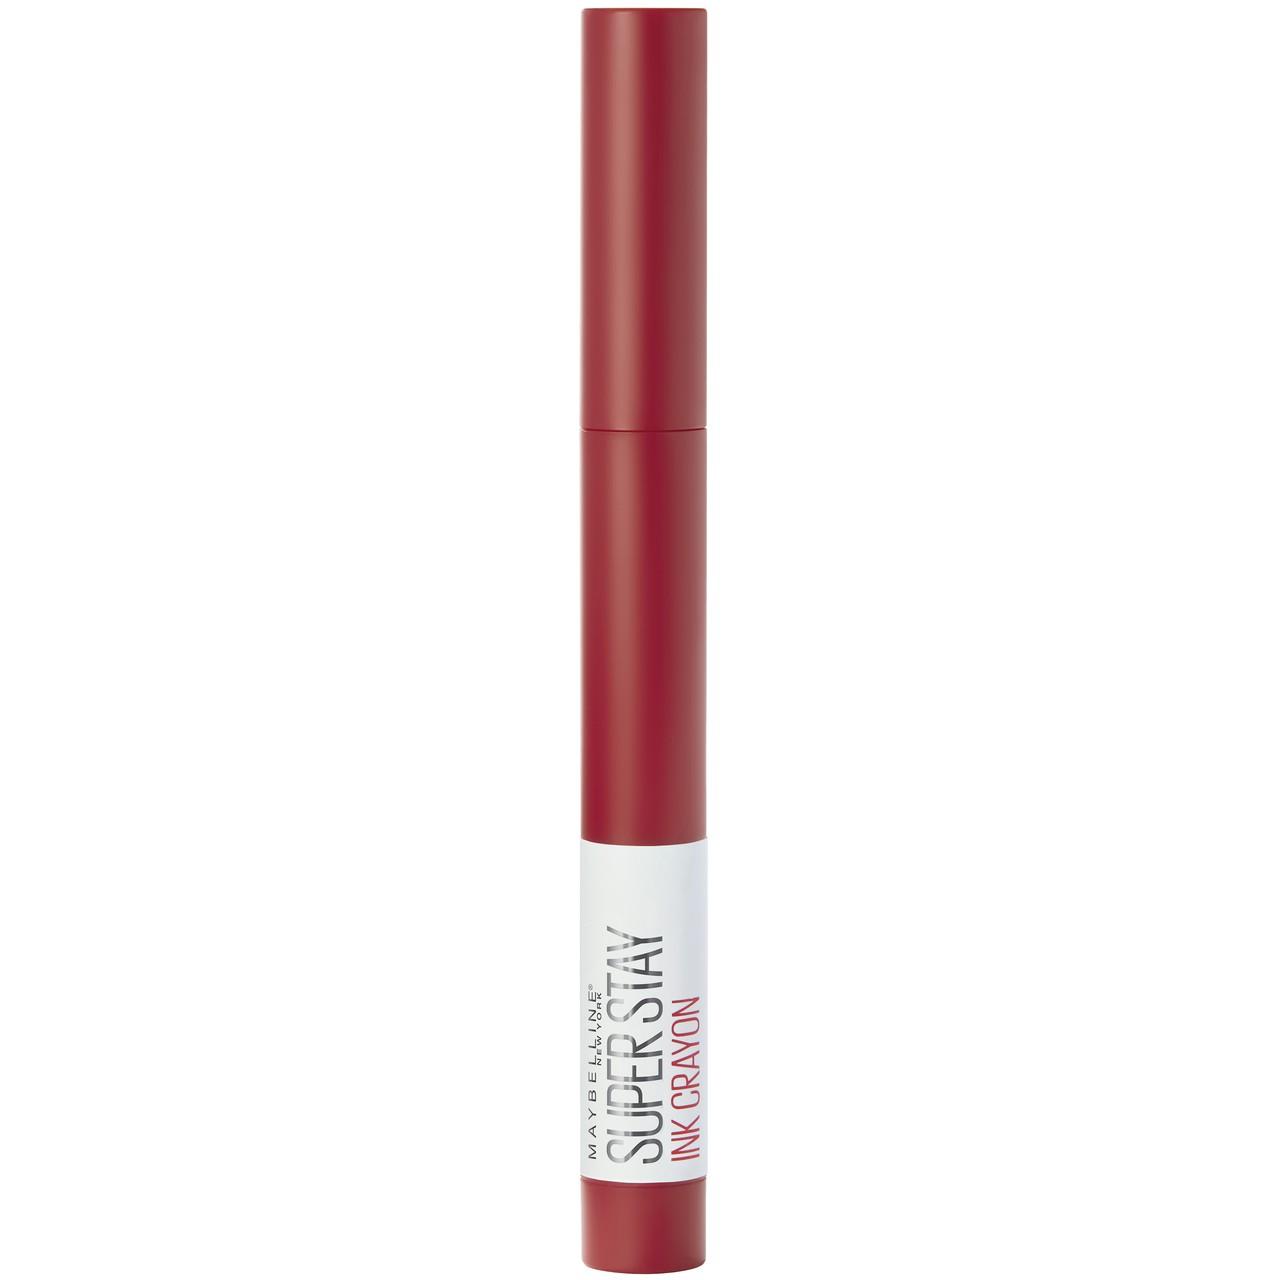 Maybelline - Batom Superstay Ink Crayon -  45 - Hustle in Heels